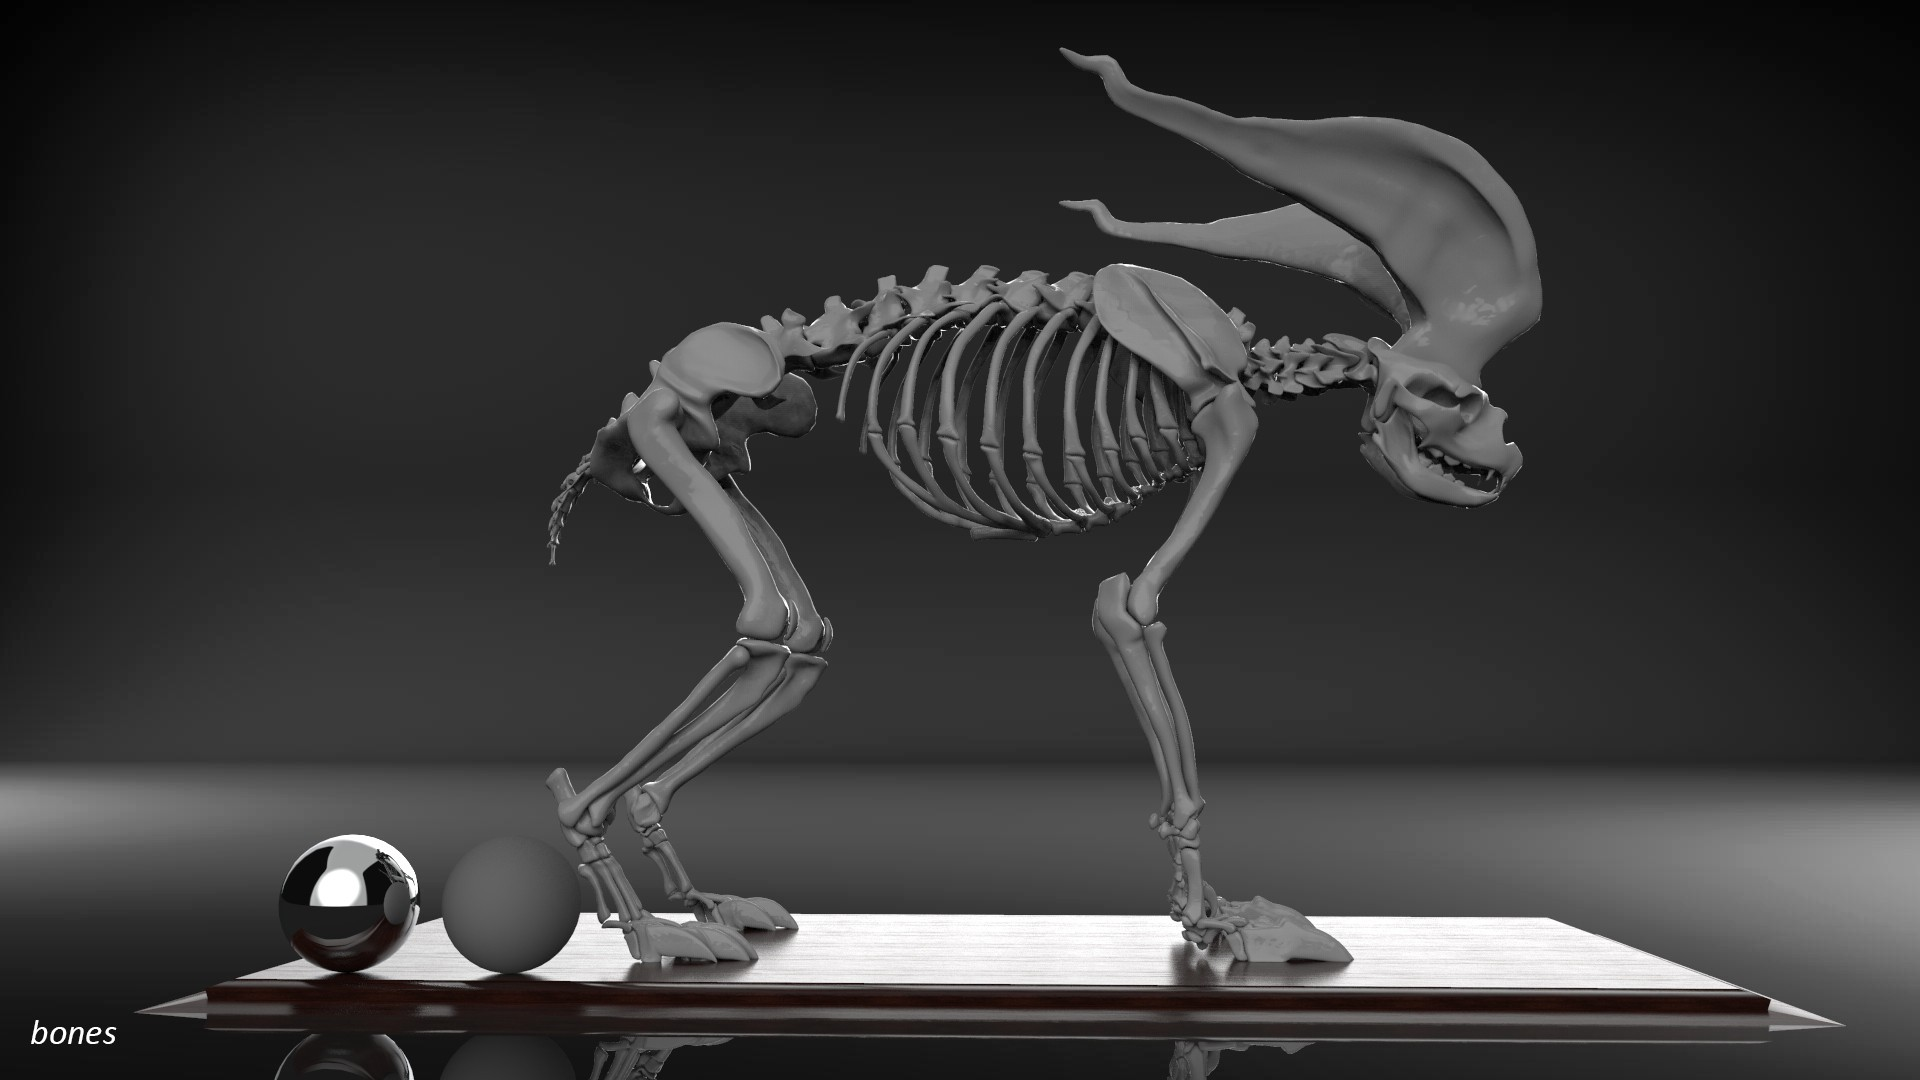 image elemex-bones.jpeg